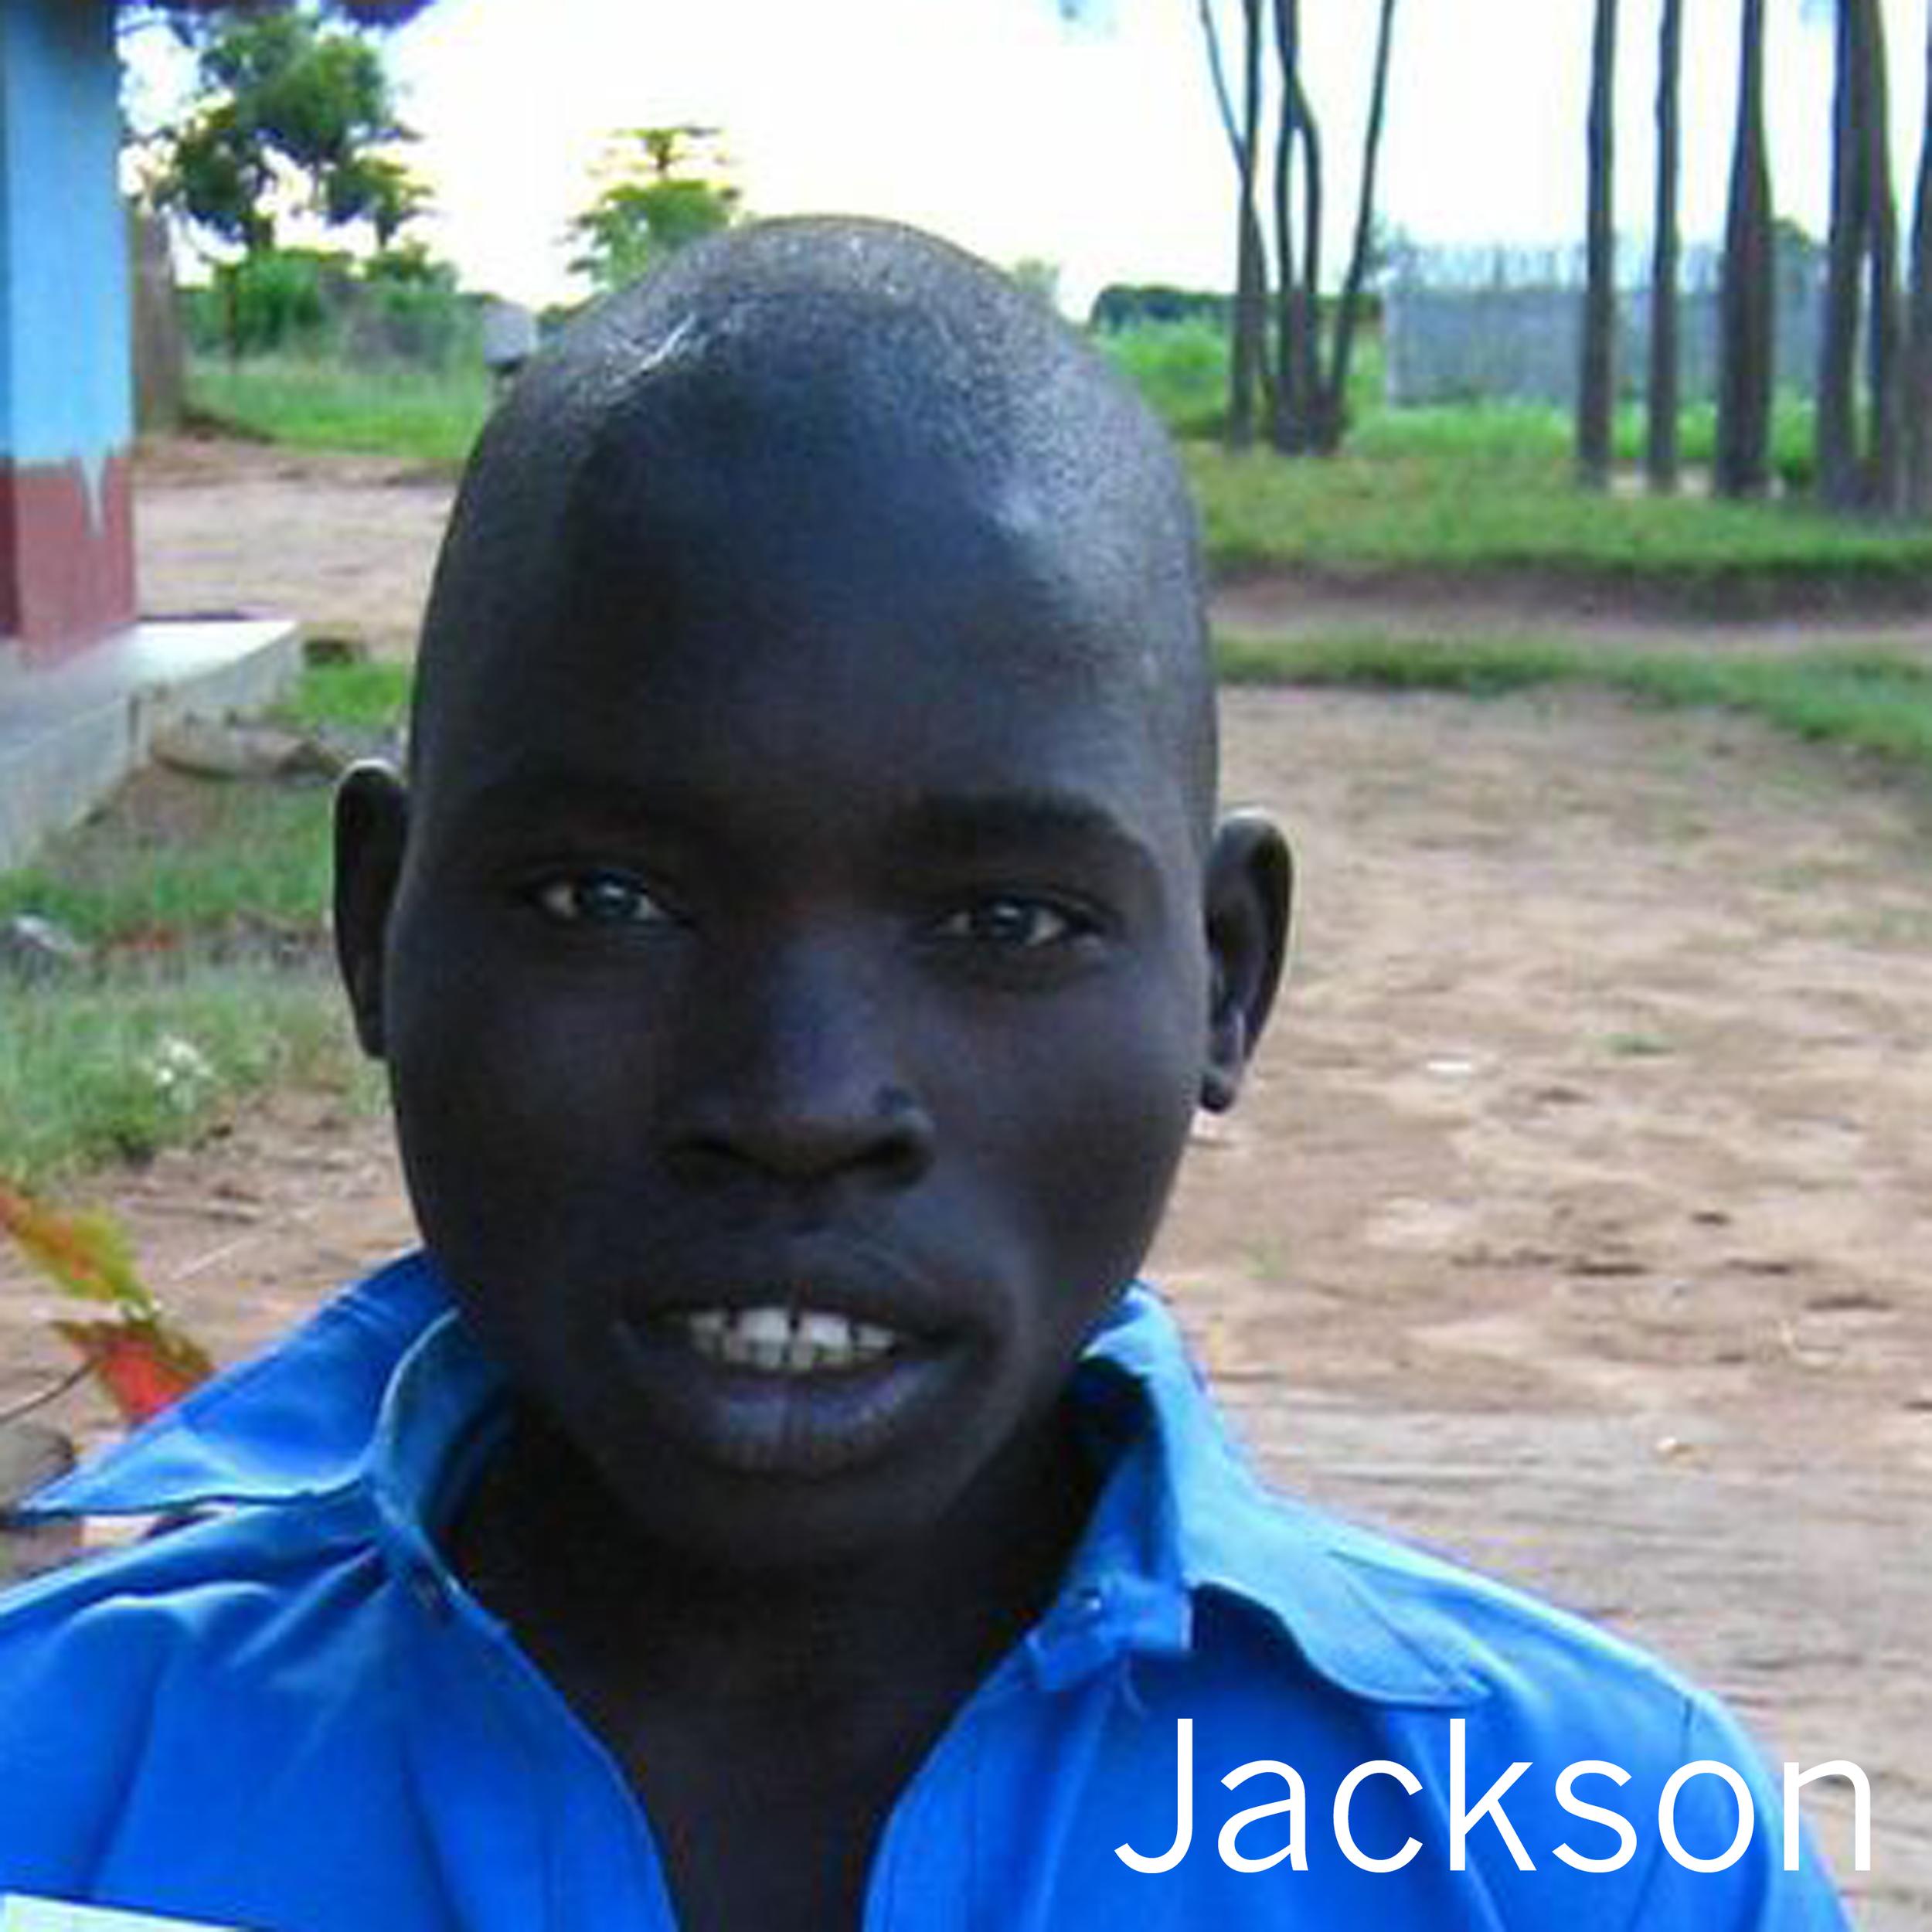 jackson001_Name.jpg